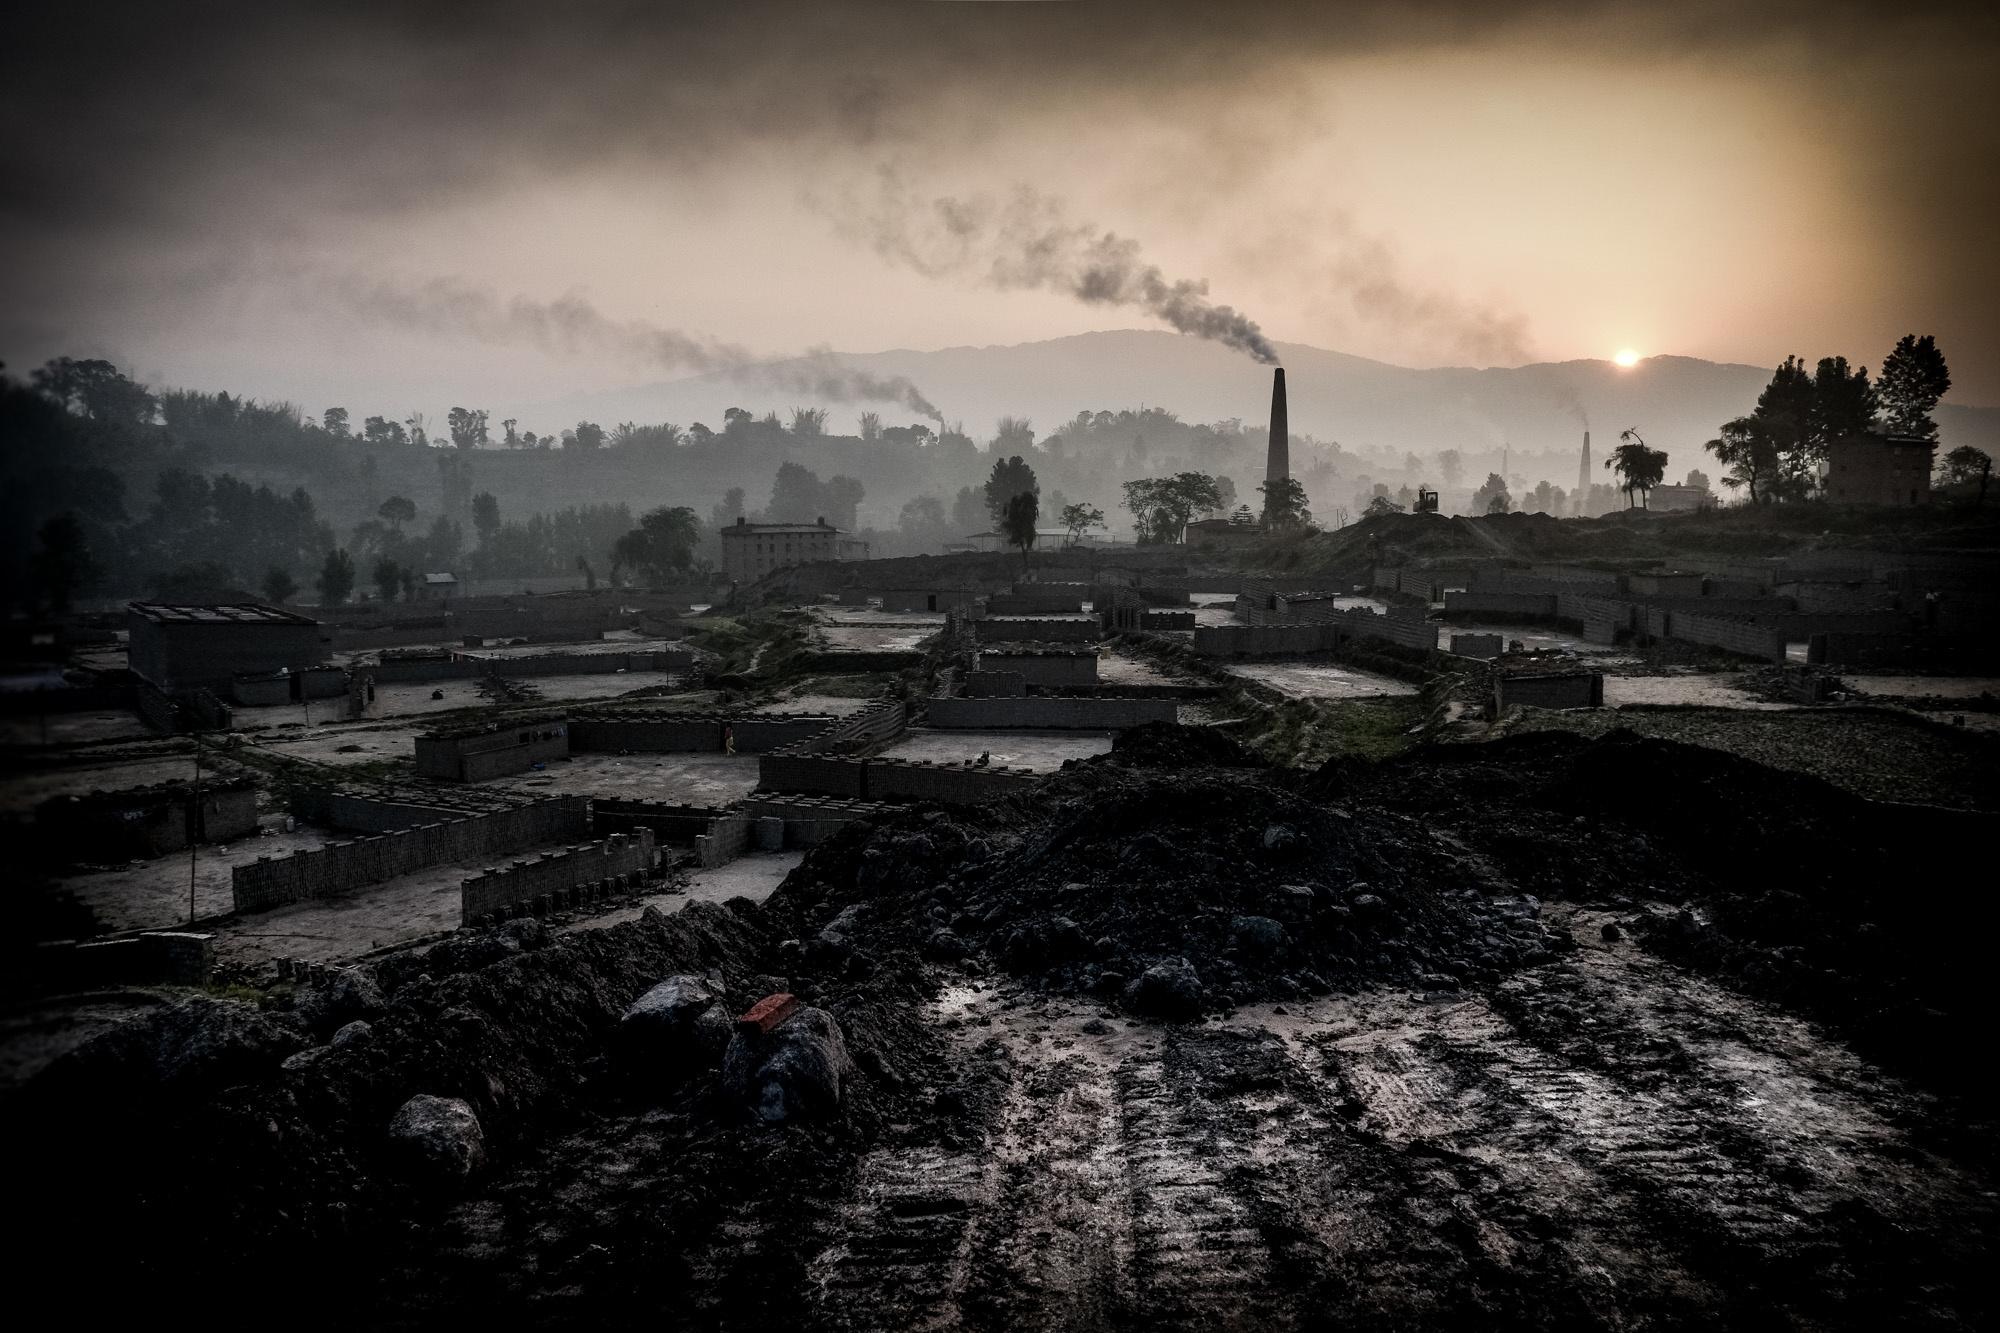 Les Miserables: Nepali Brick-Makers